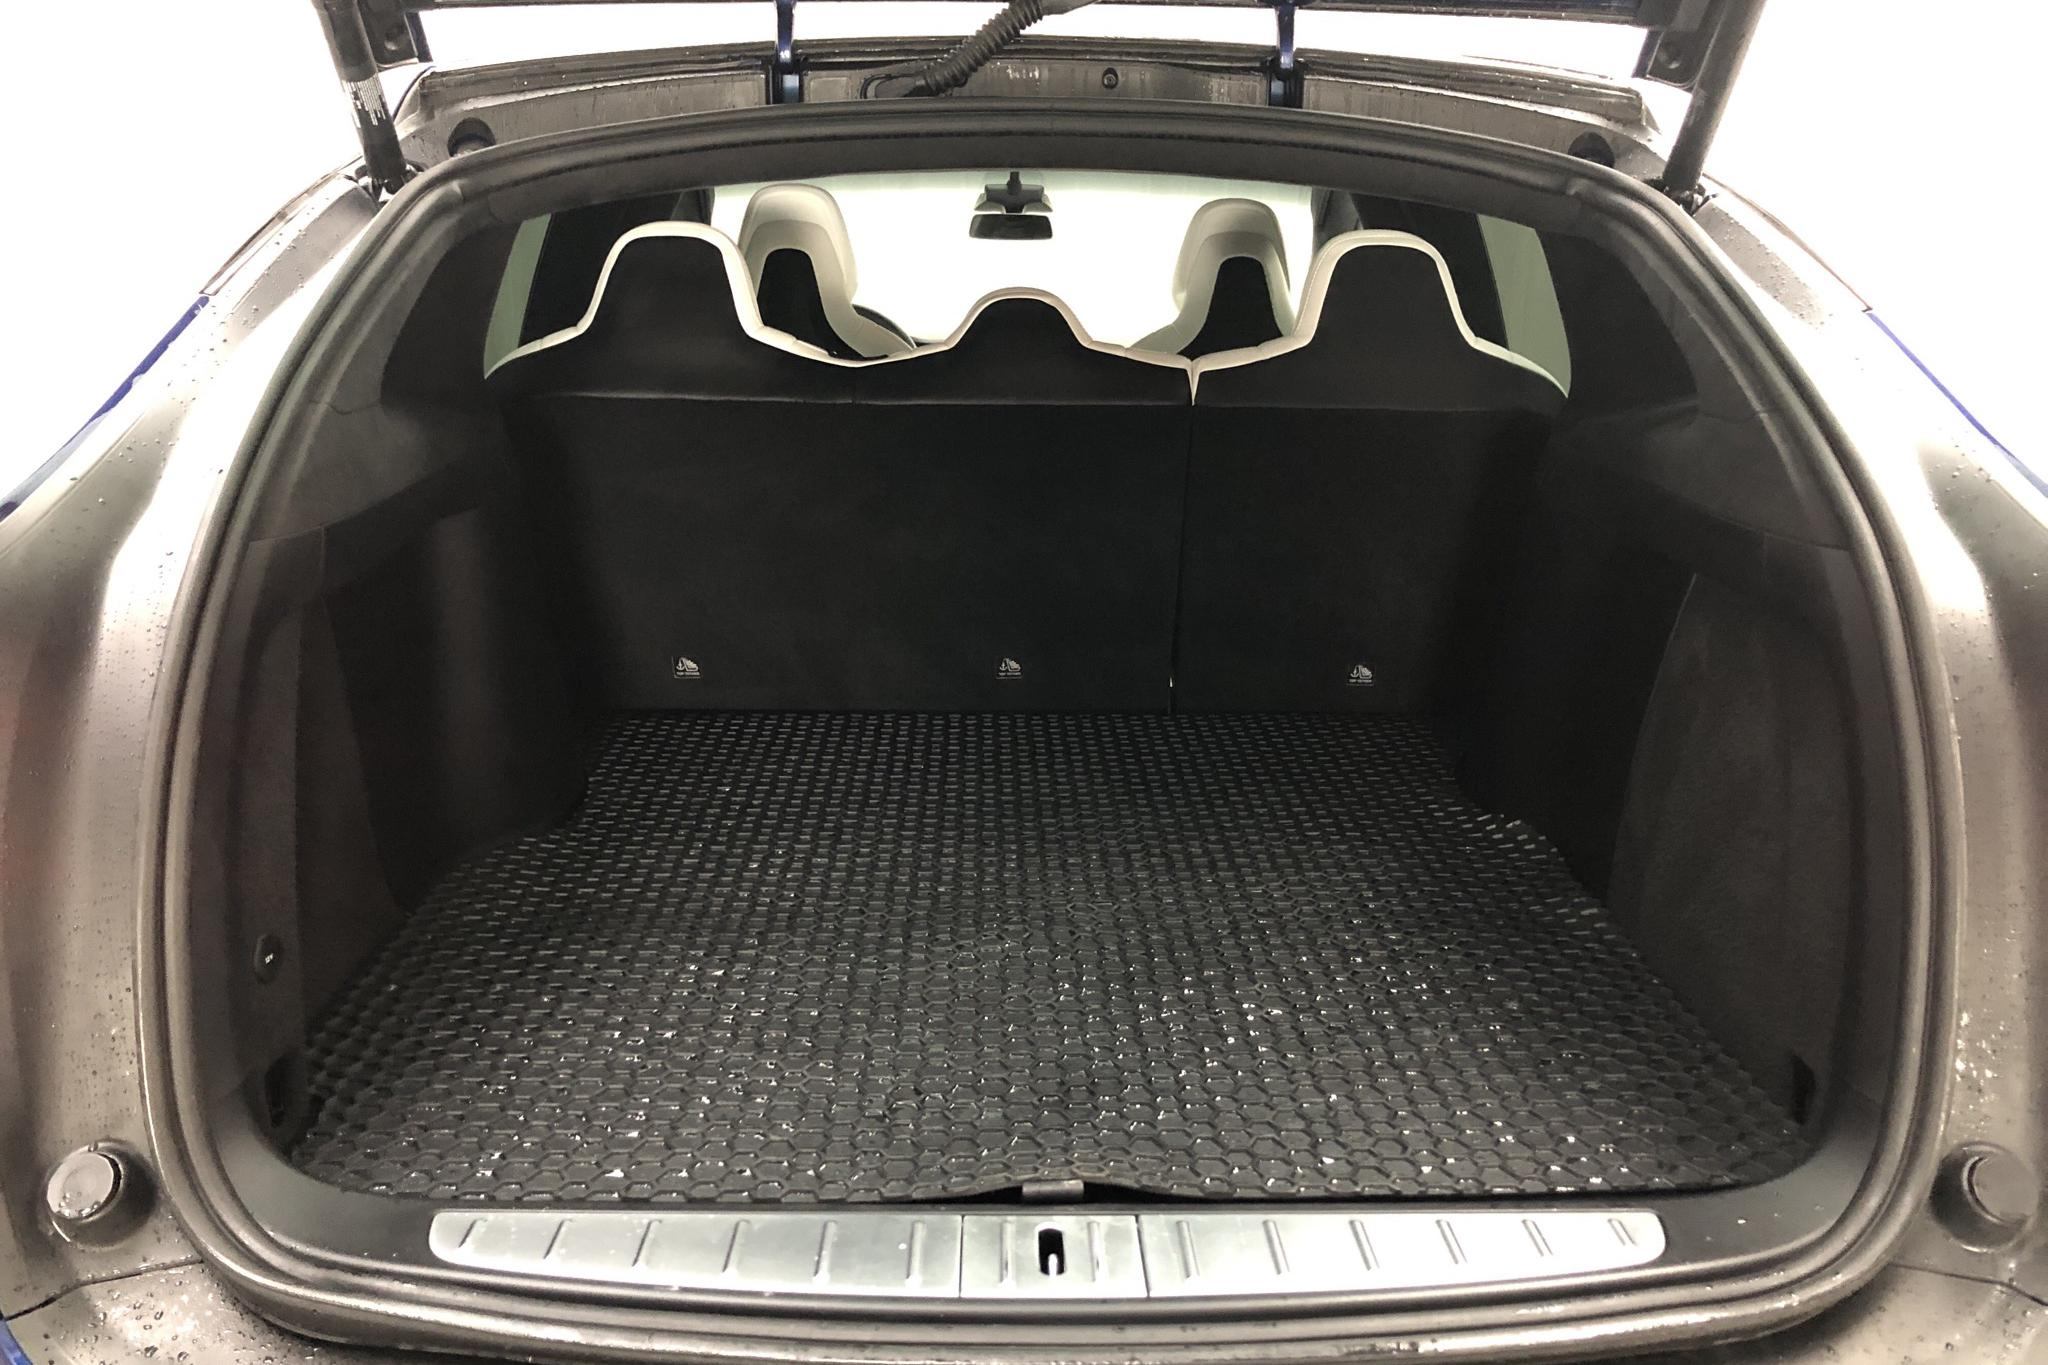 Tesla Model X 75D - 63 800 km - Automatic - blue - 2018